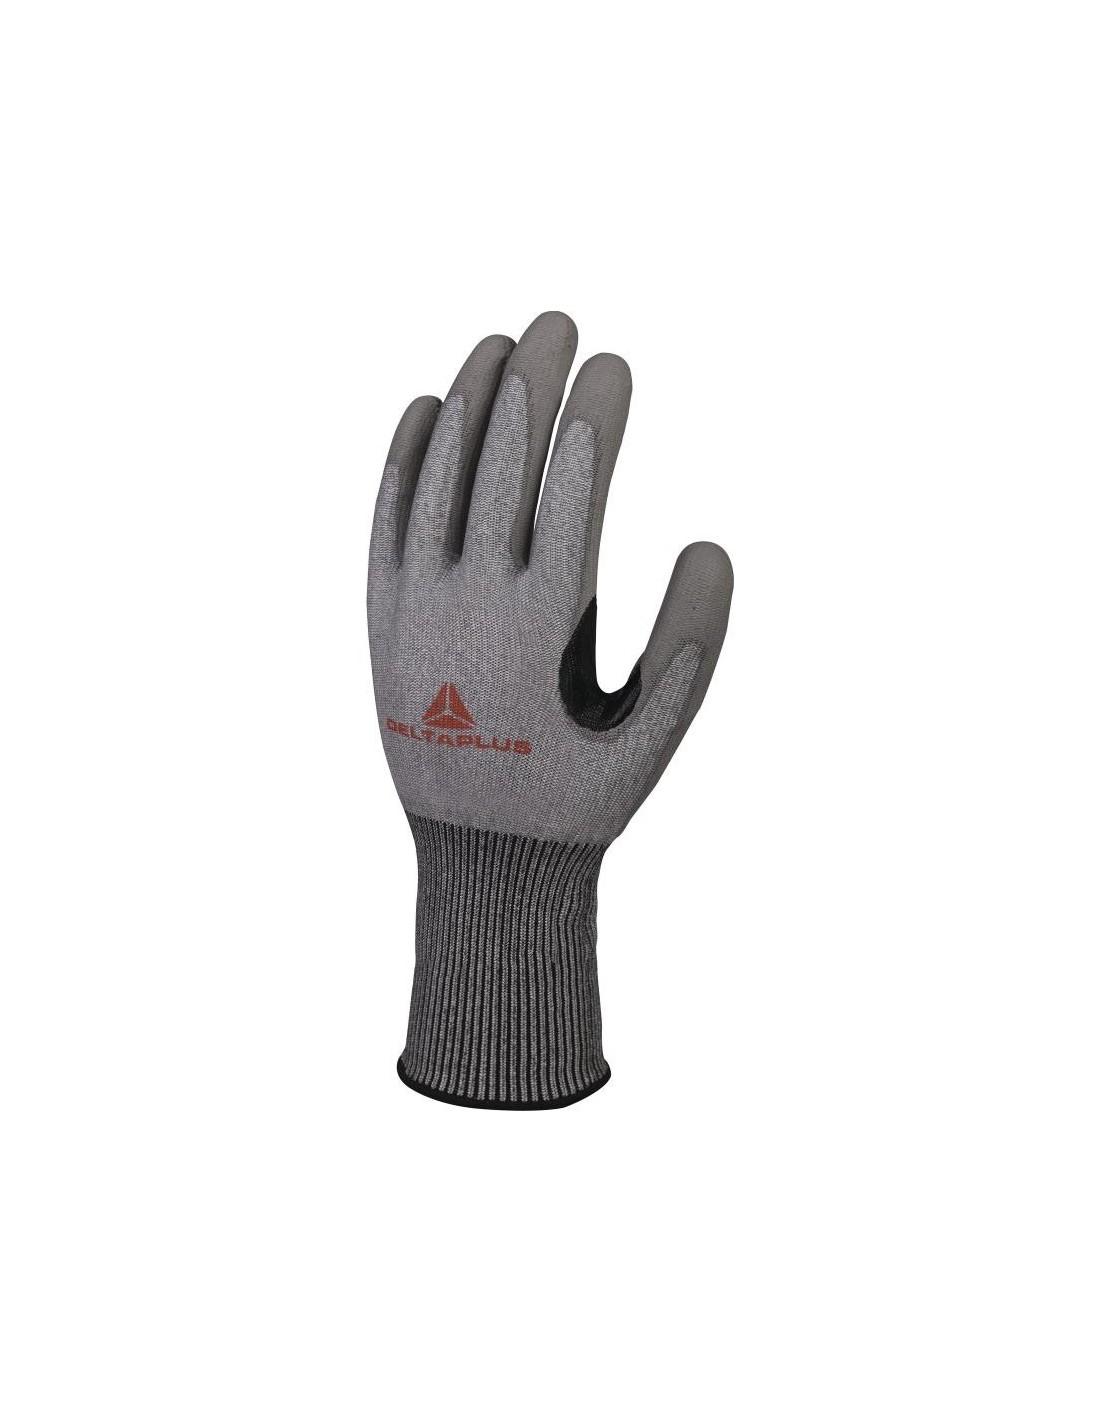 gant anti coupure taille des gants 7. Black Bedroom Furniture Sets. Home Design Ideas